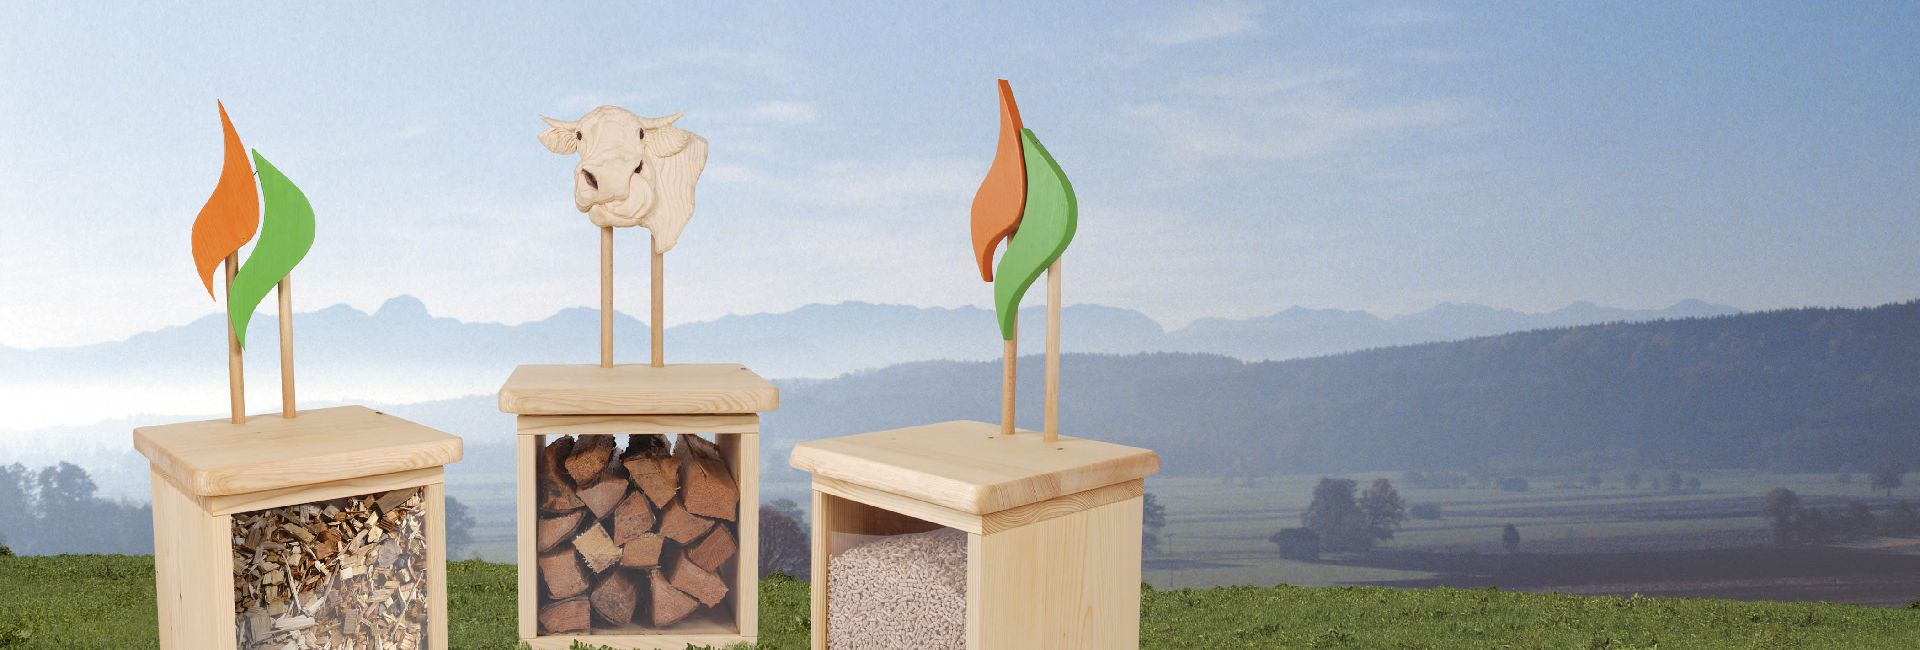 Bioenergieregion Oberland